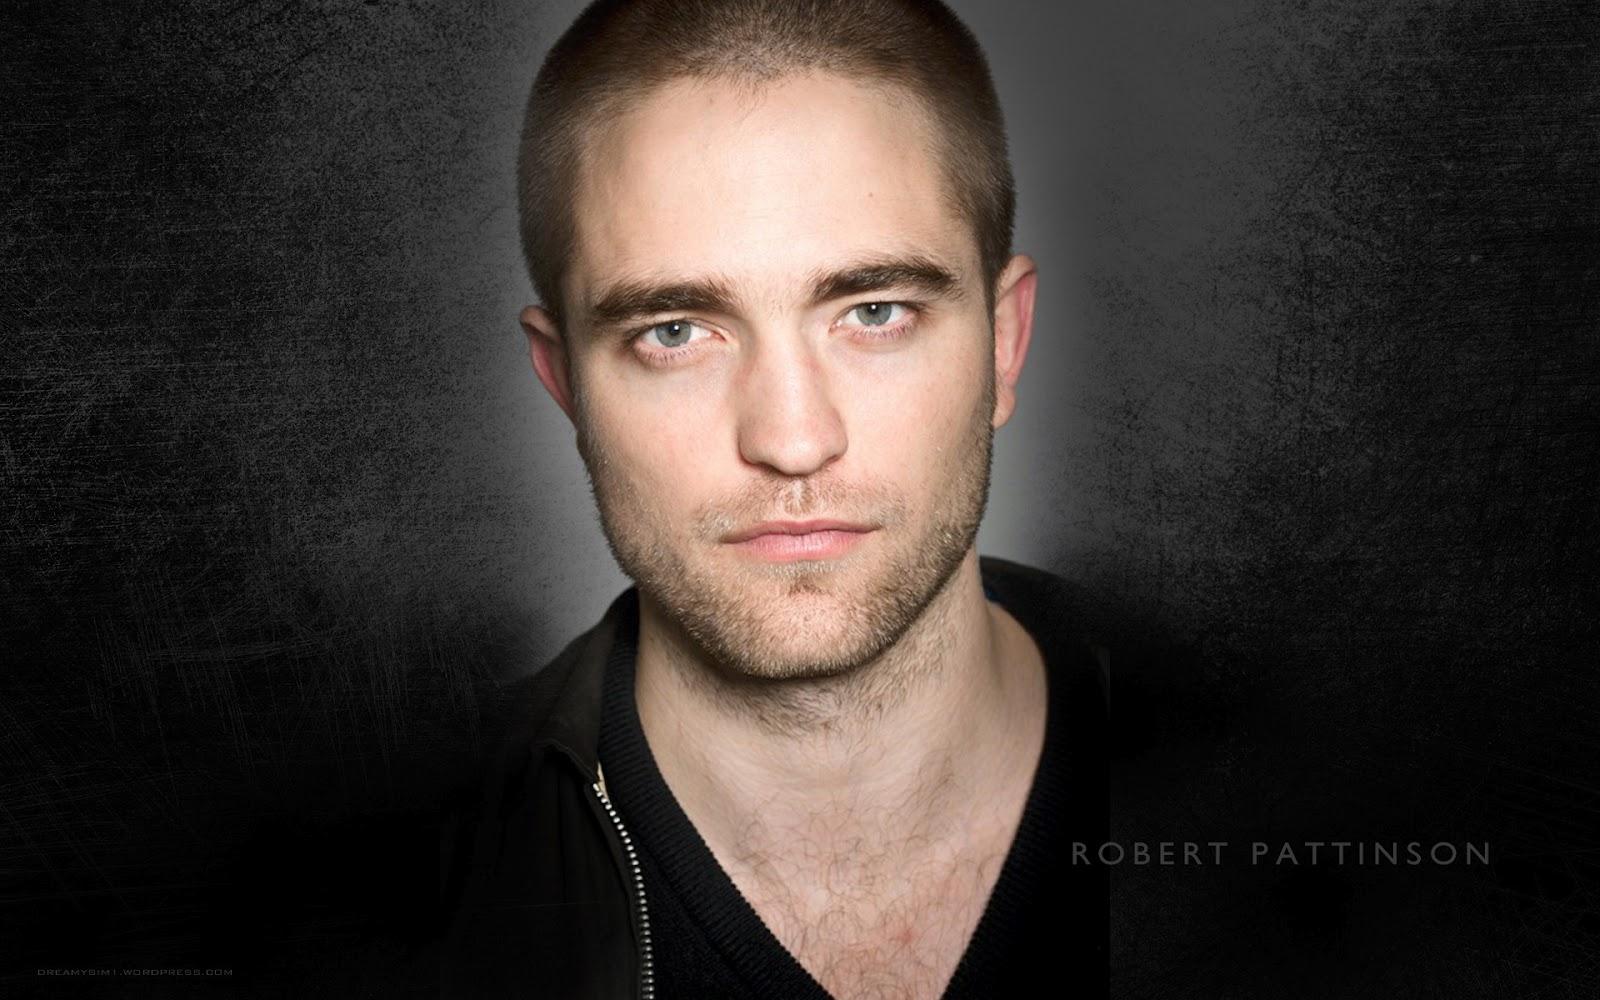 http://2.bp.blogspot.com/--17SSGSOBG4/T0-vFDpJCVI/AAAAAAAAFQI/iXcOxB4Ifq8/s1600/Robert-Pattinson+%5BDesktopNexus.com%5D.jpg